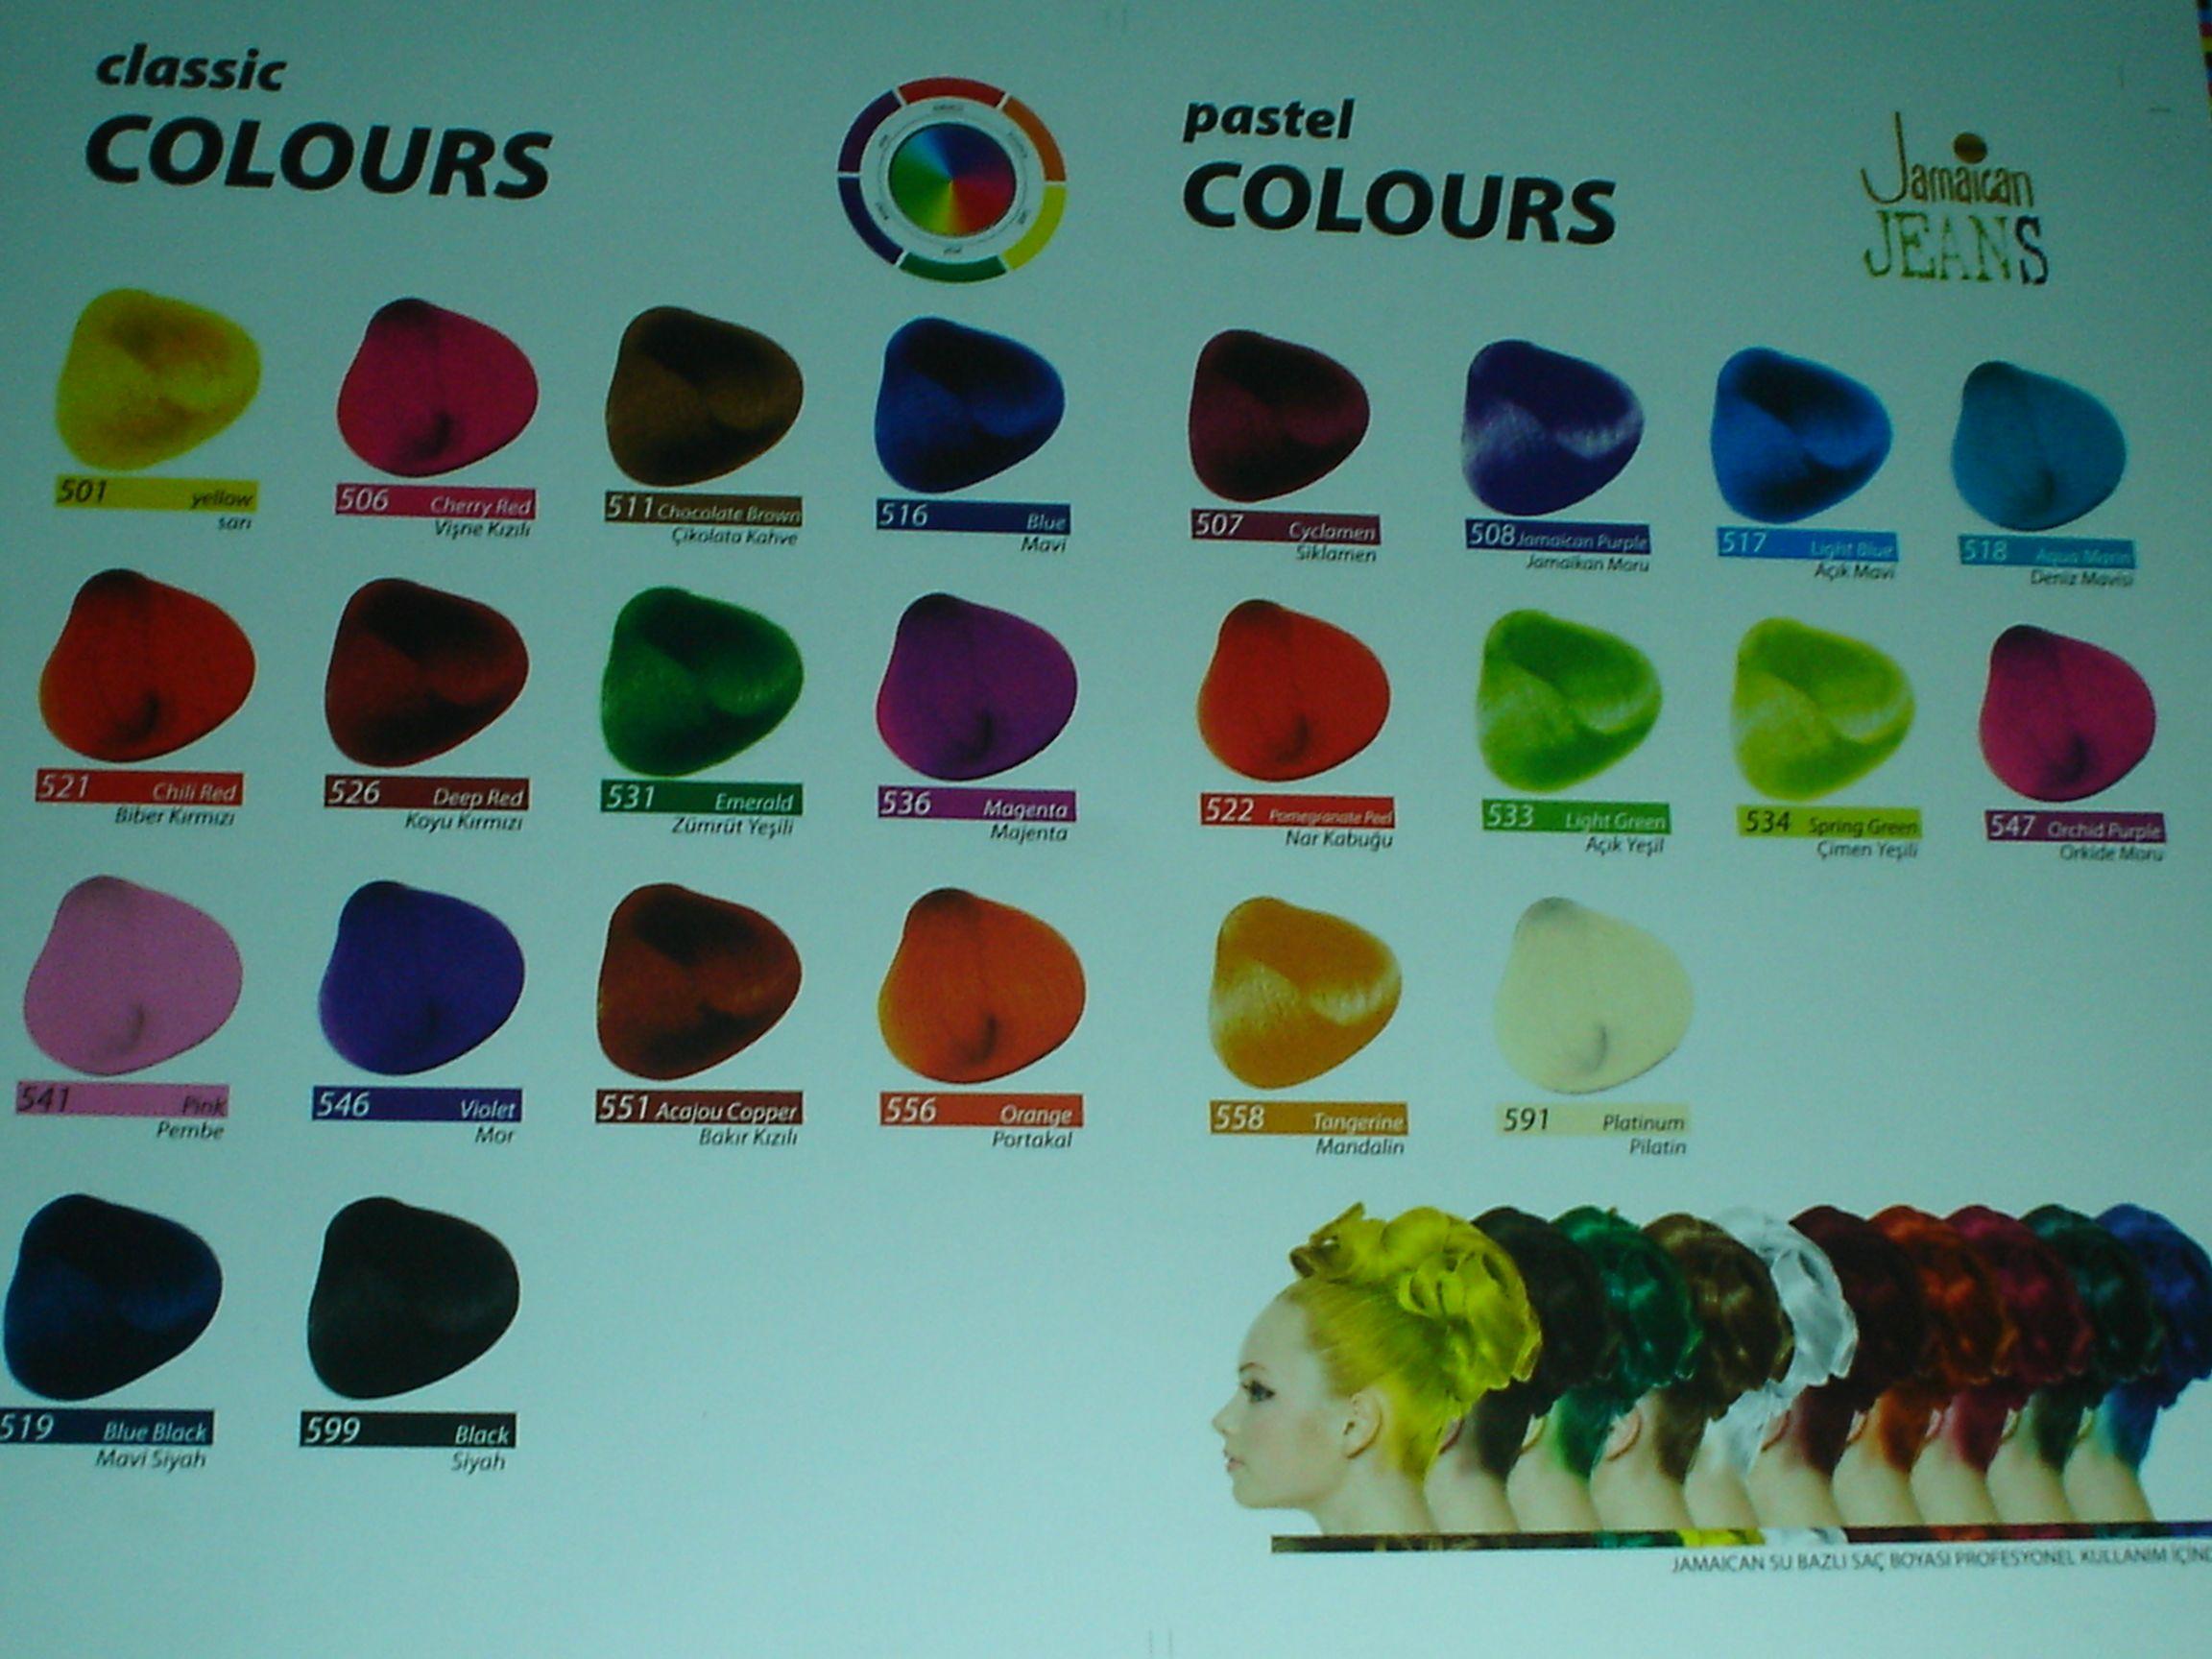 Jamaican Jeans Sac Boyasi Renk Kartelasi Renkler Sac Boyasi Sac